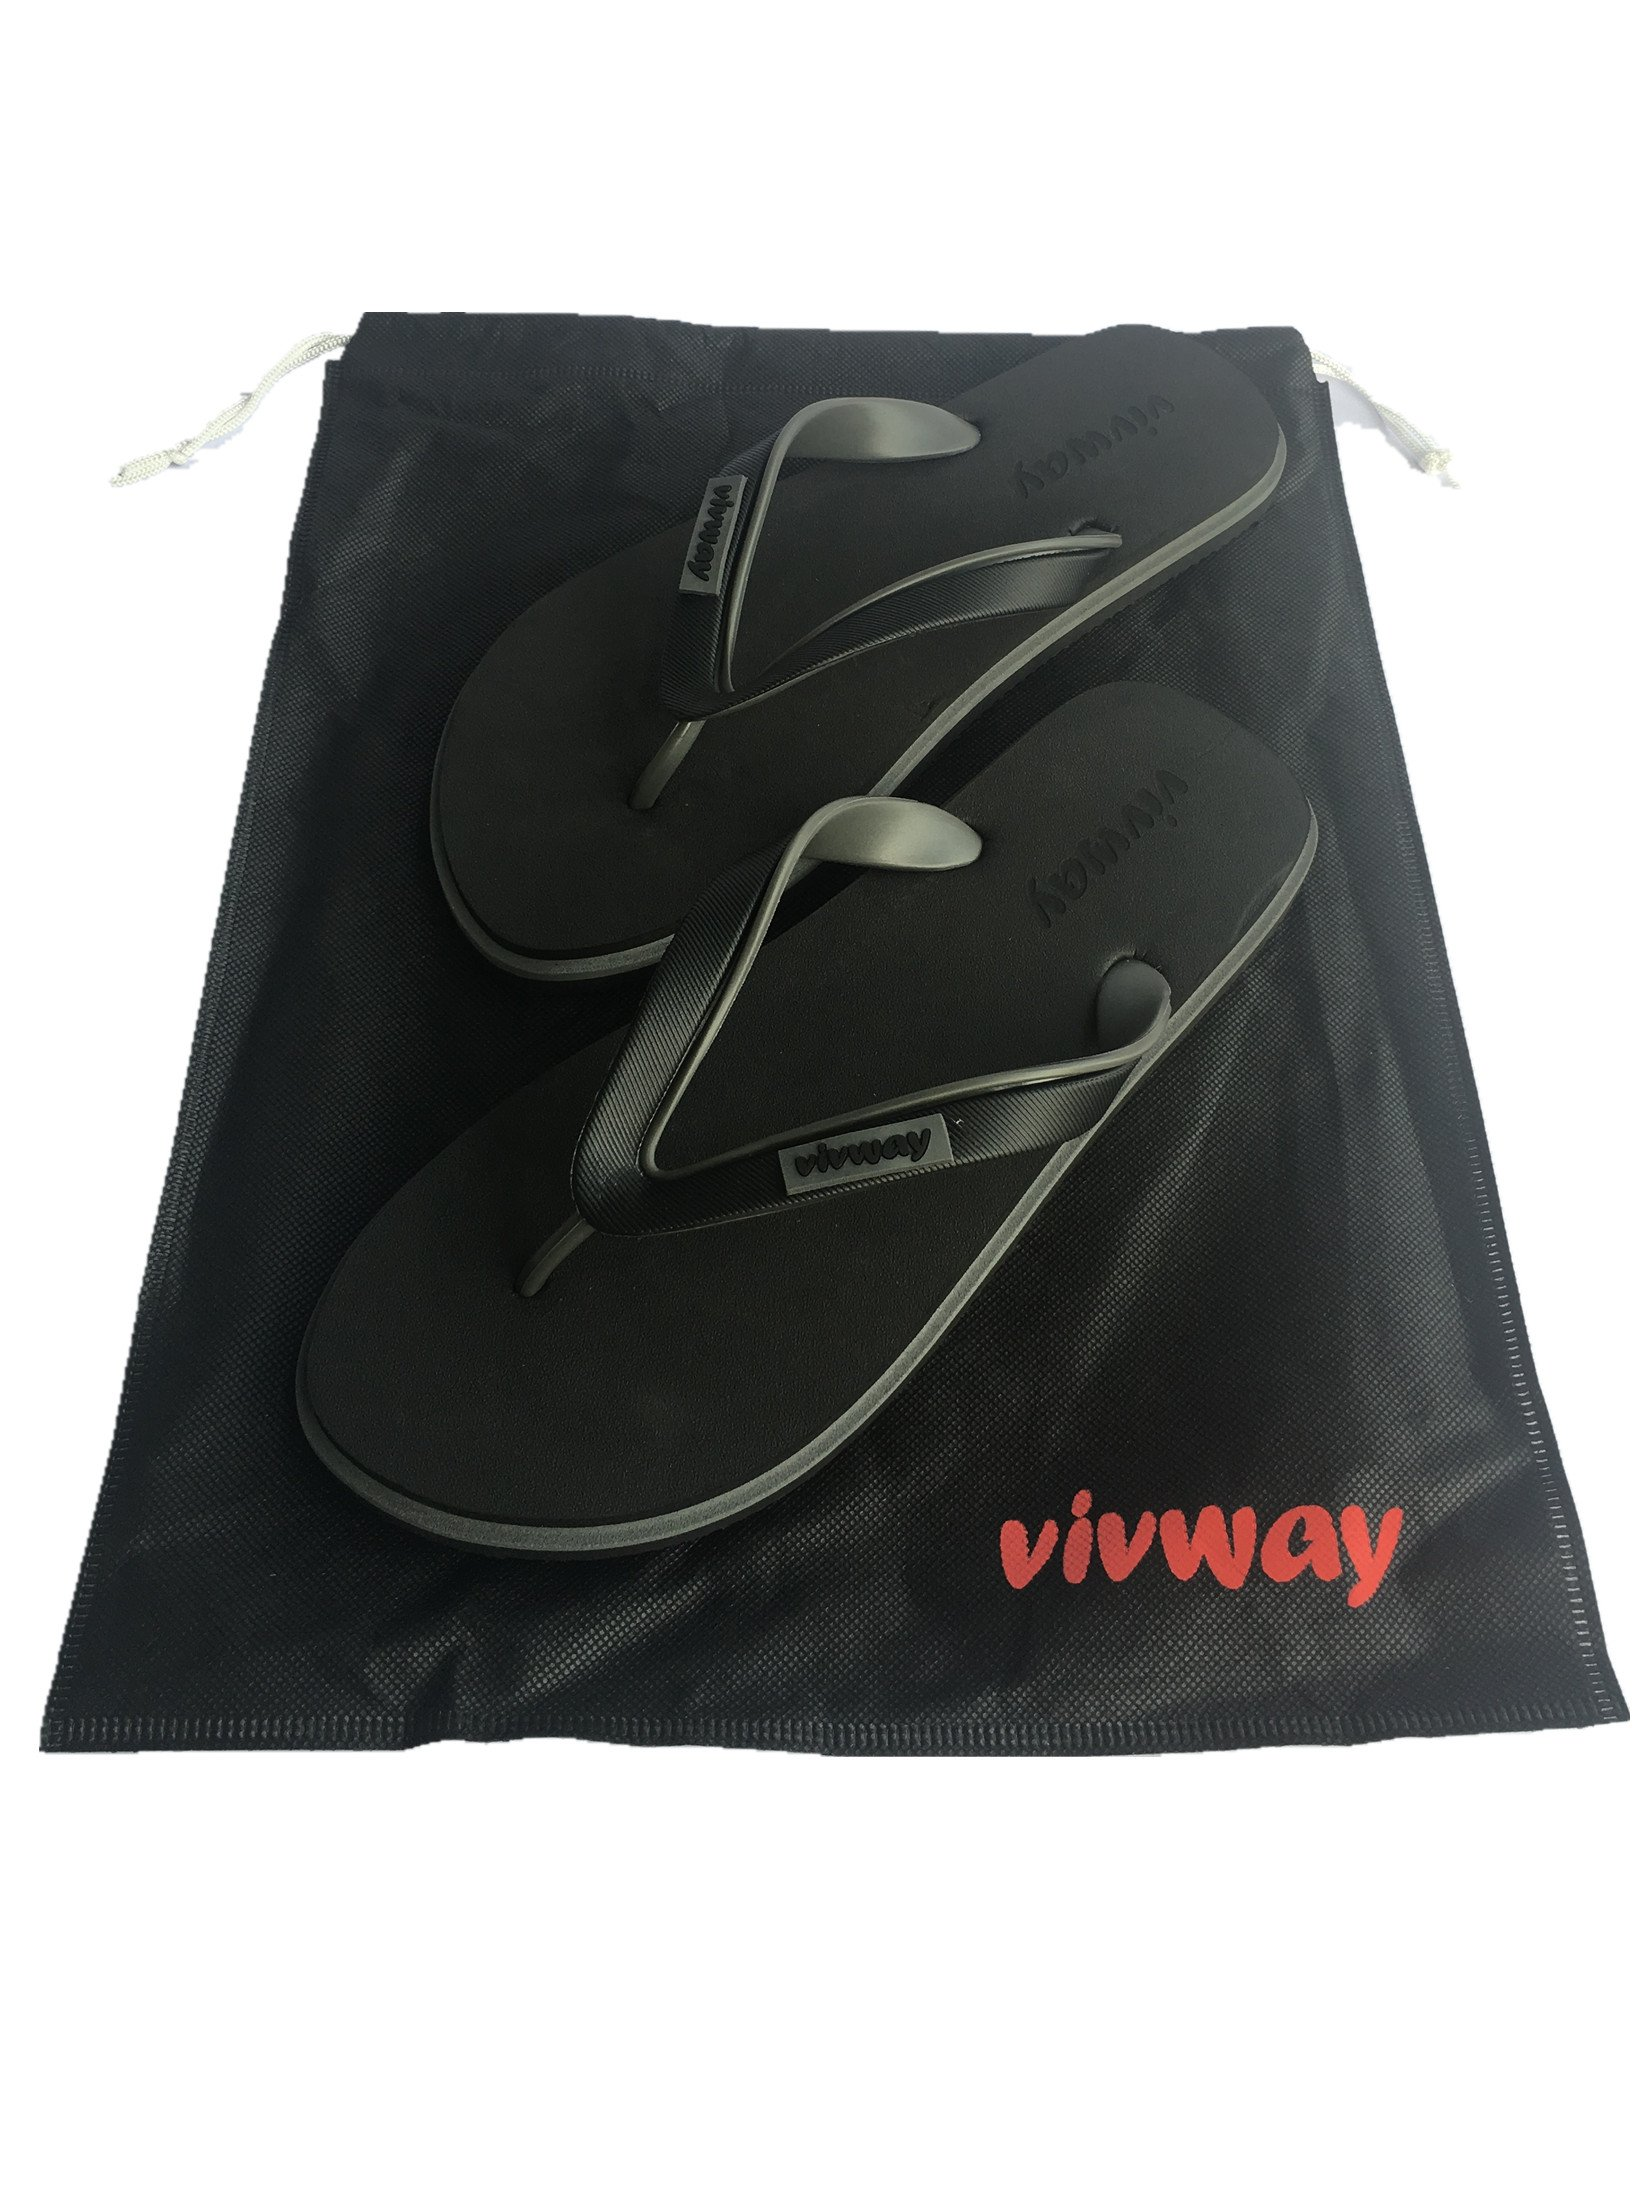 VIVWAY Men's Summer Beach Flip-Flops Thongs Flexible Fashion Sandals Classical Lightweight Non-Slip Black Slippers US8